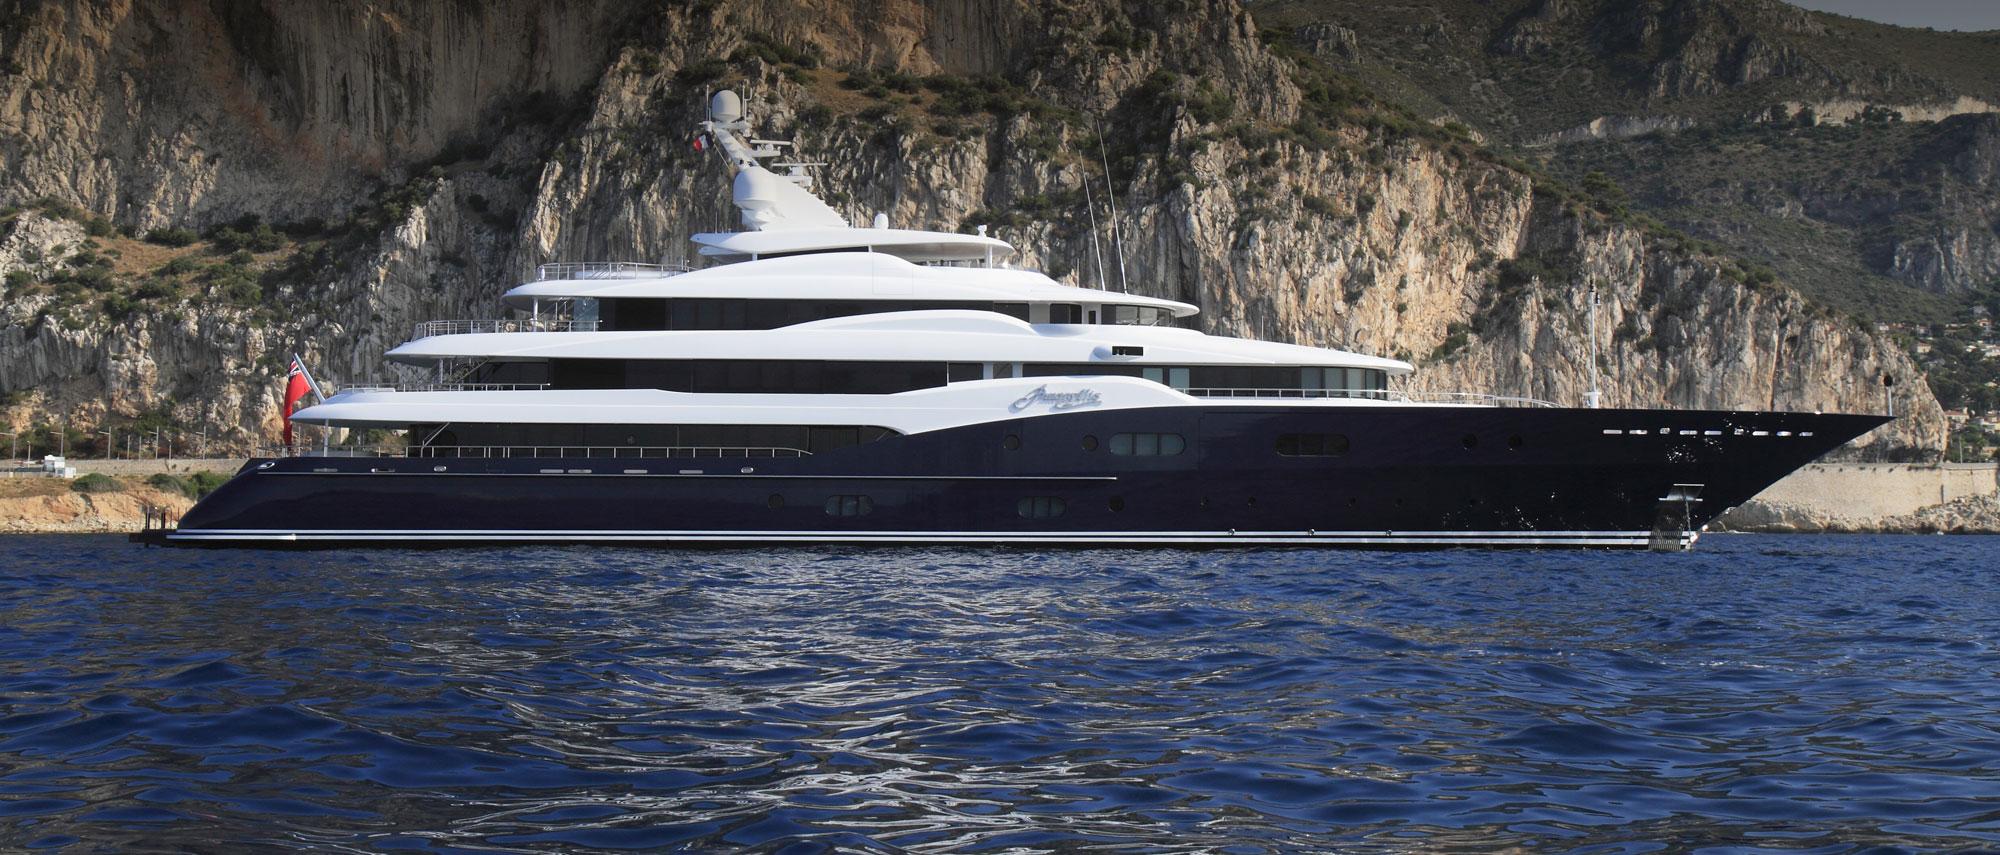 Cayman flagged pleasure yacht AMARYLLIS